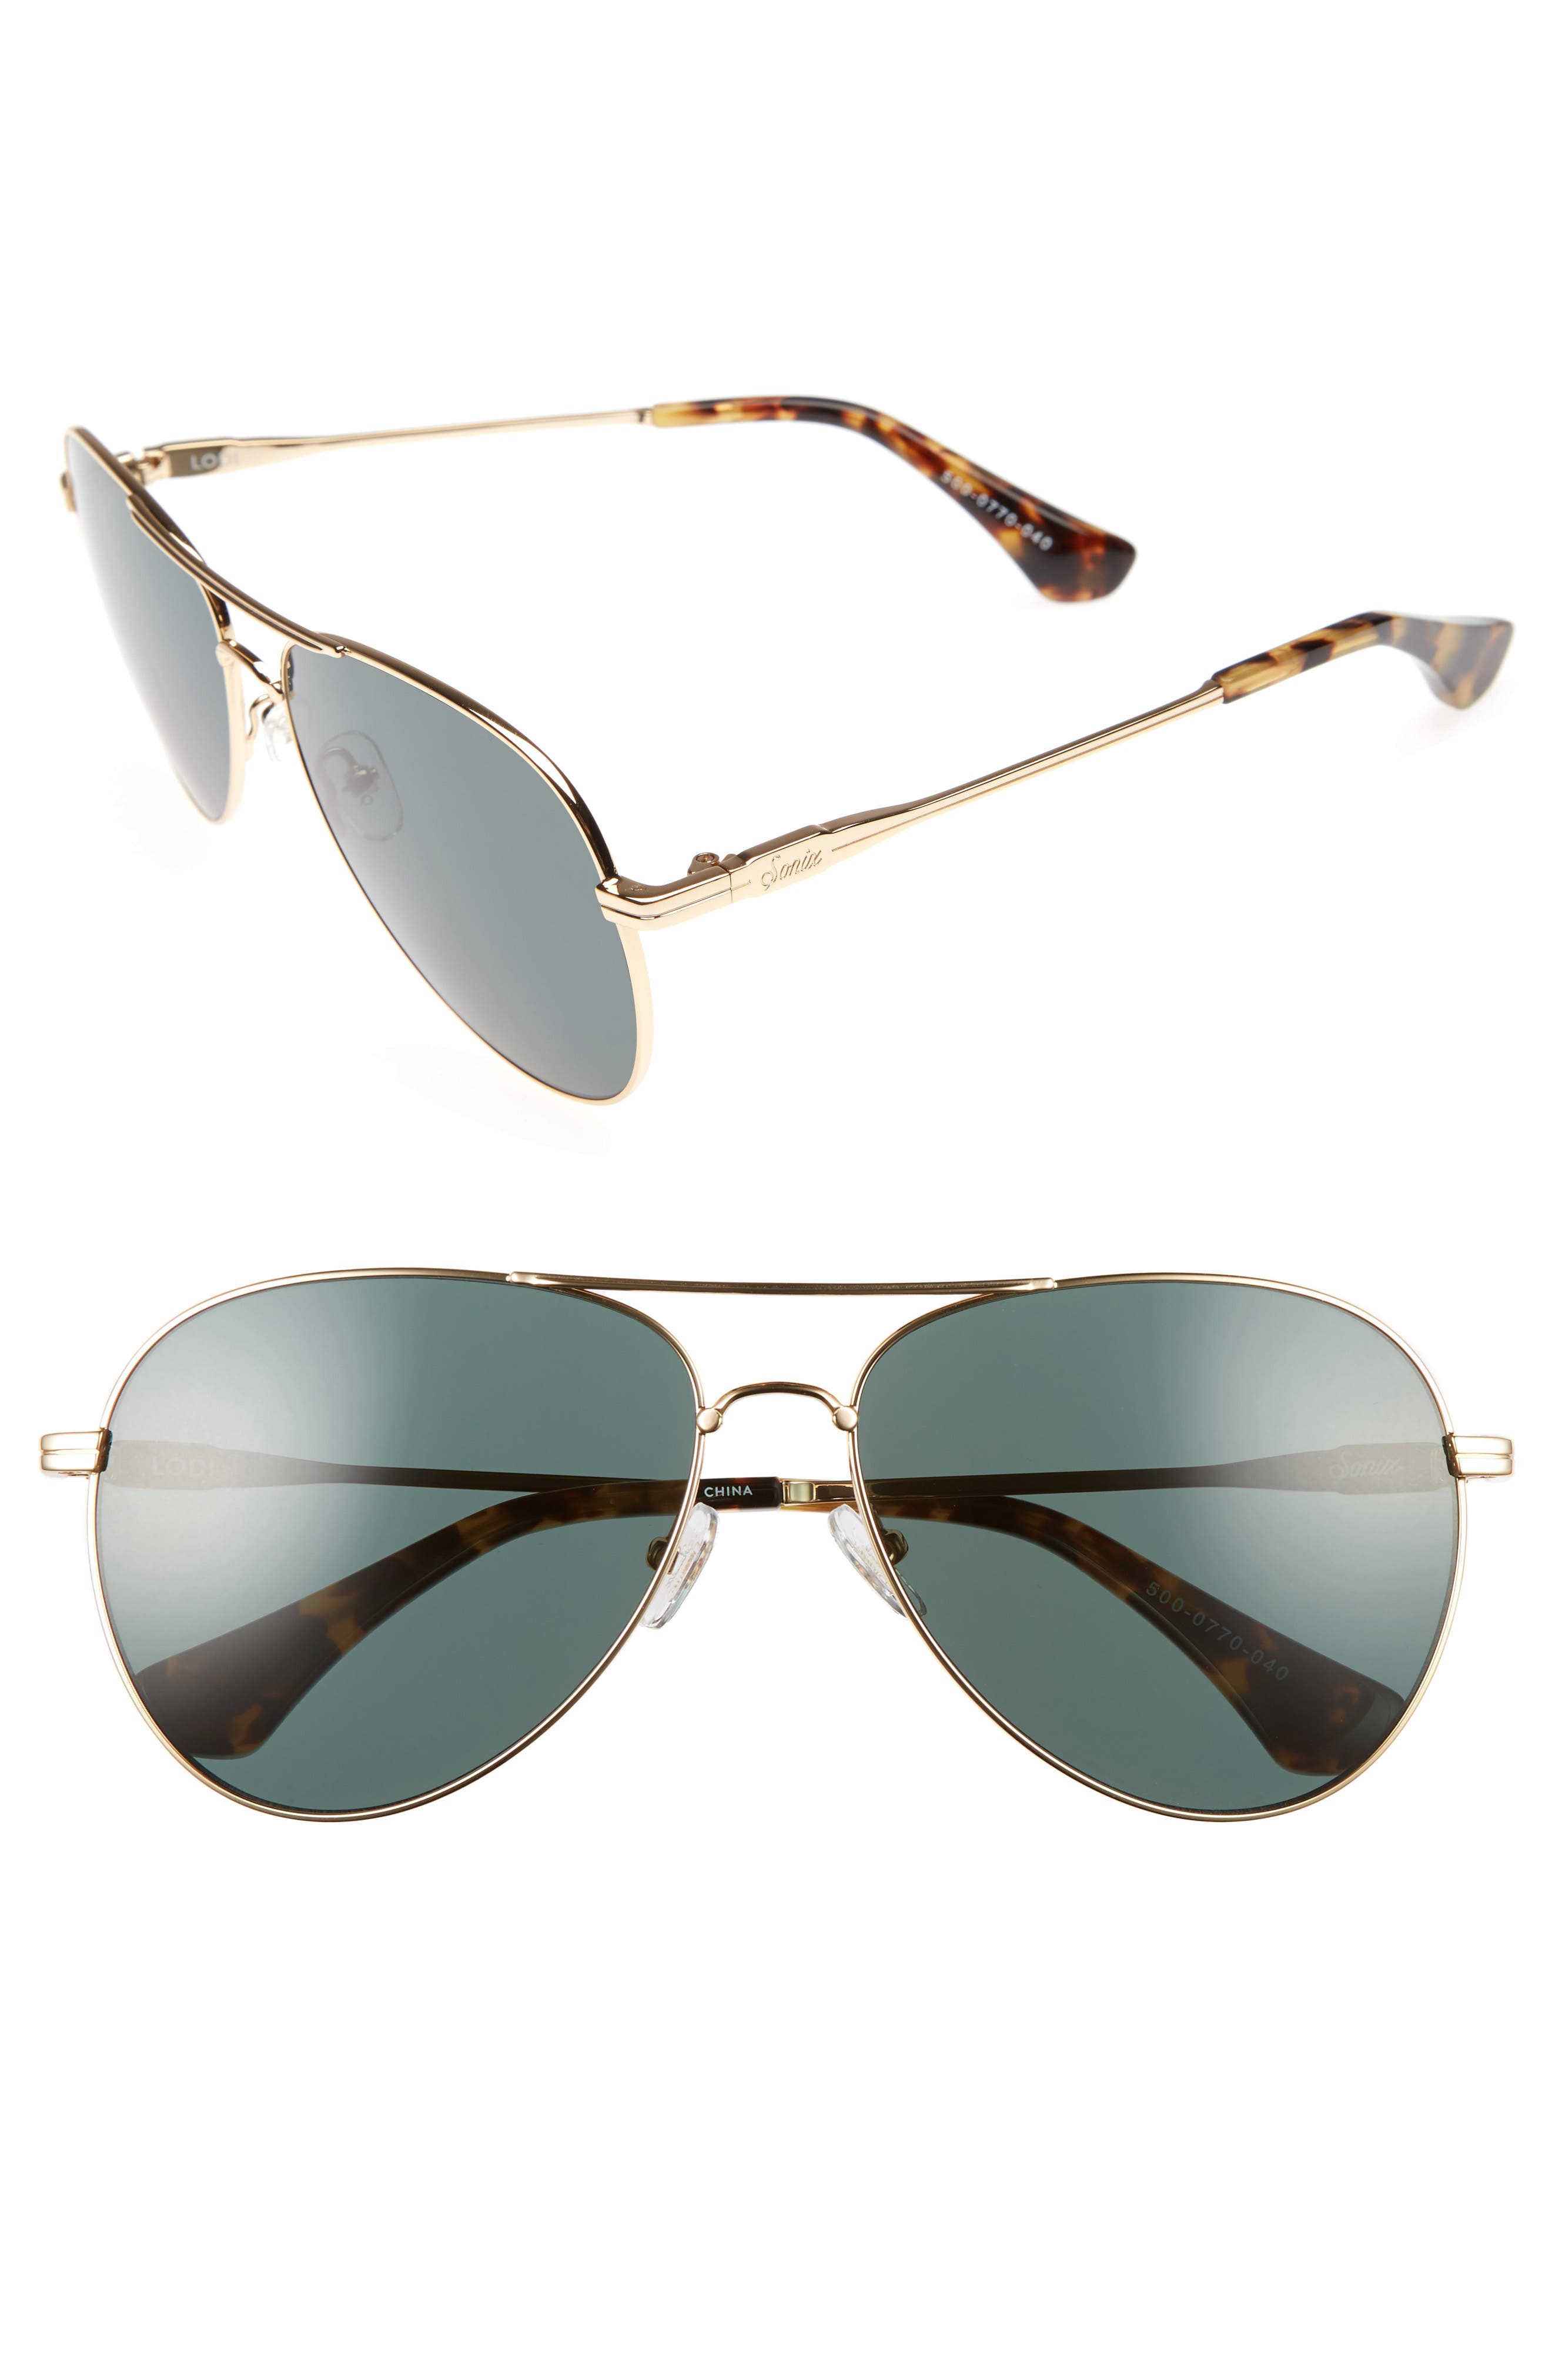 Lodi 62mm Mirrored Aviator Sunglasses,                             Alternate thumbnail 16, color,